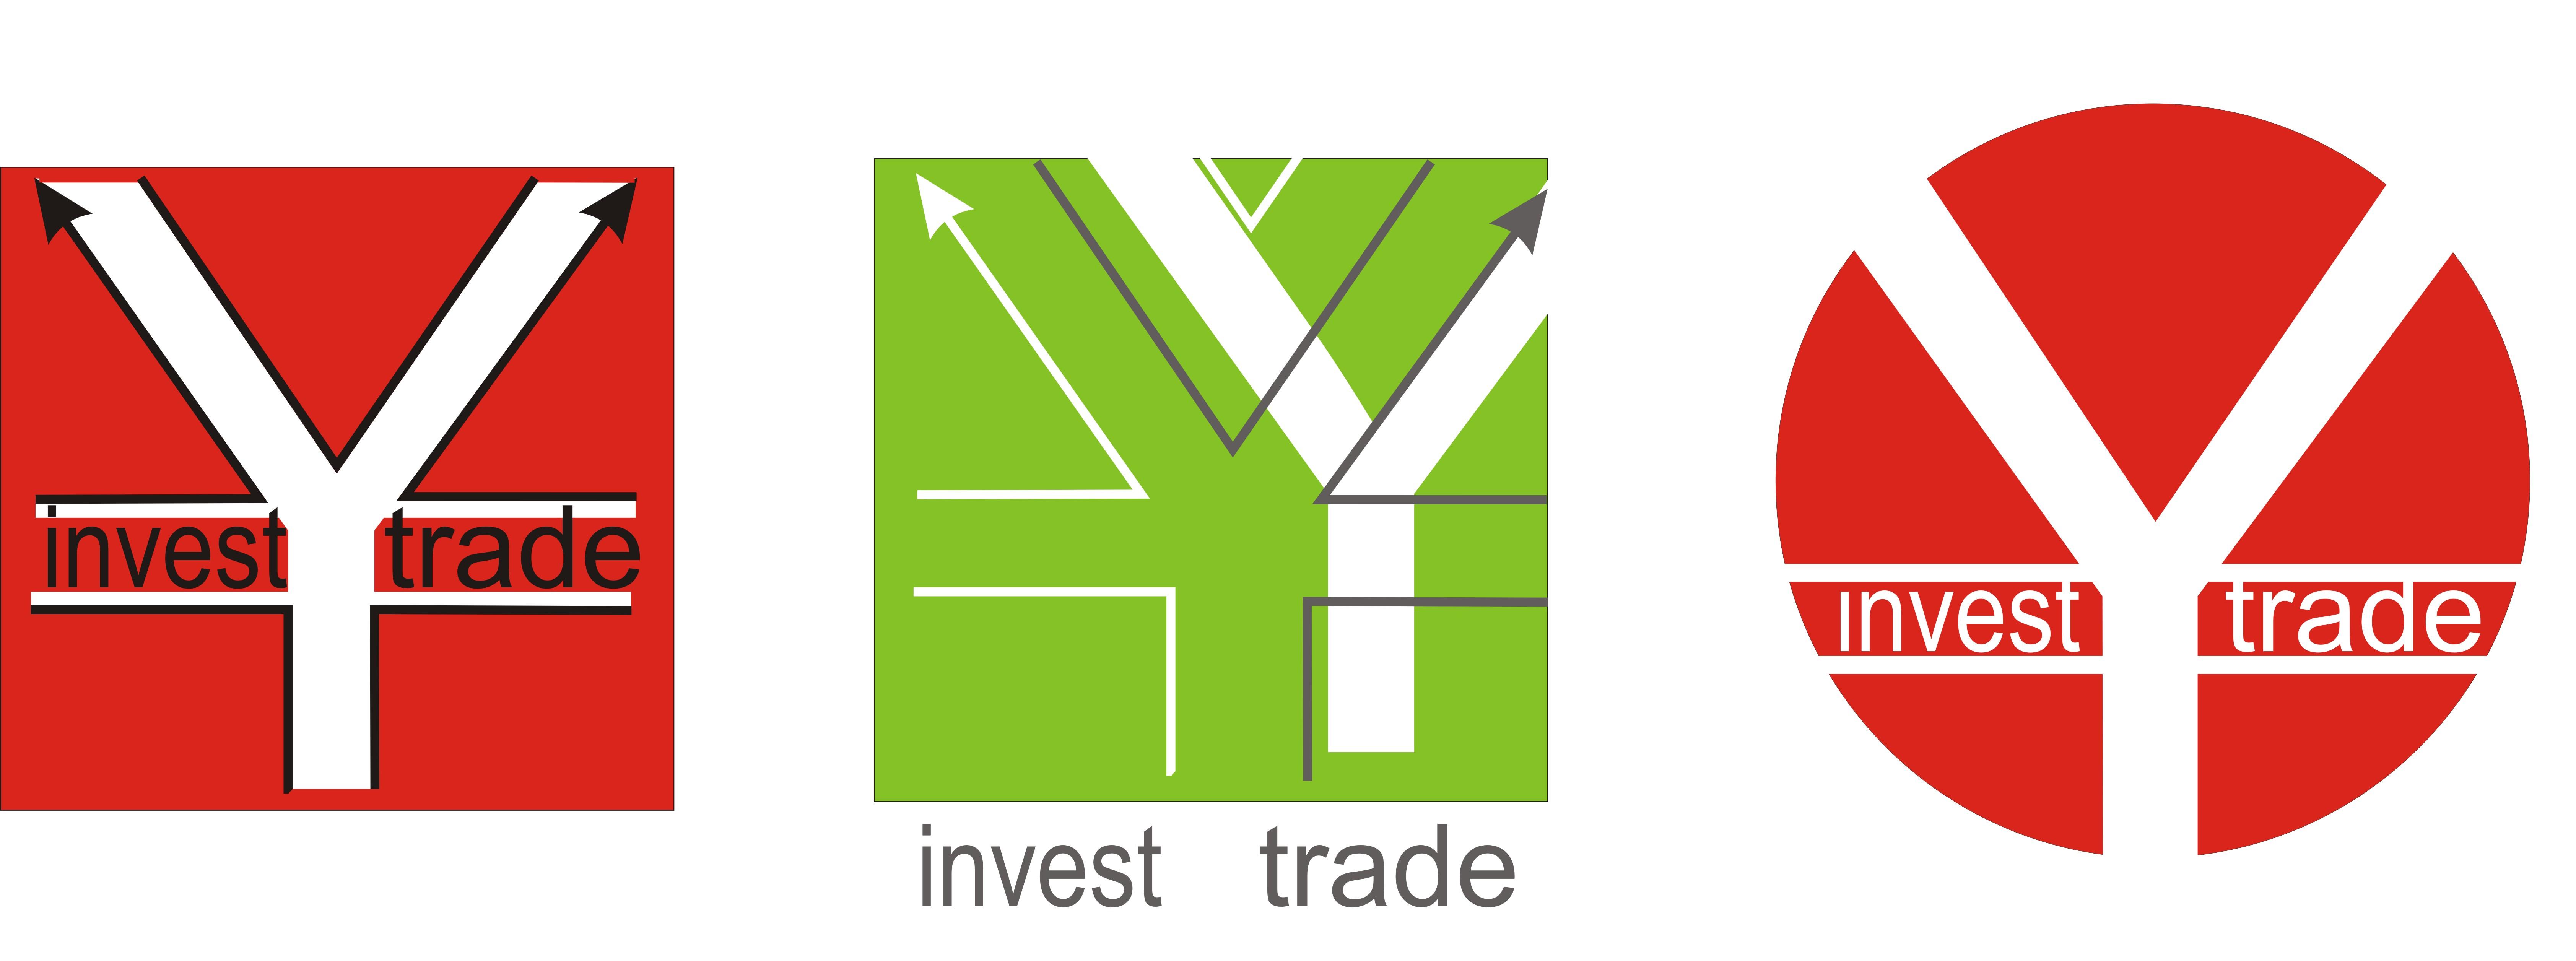 Разработка логотипа для компании Invest trade фото f_2845130df149c794.jpg